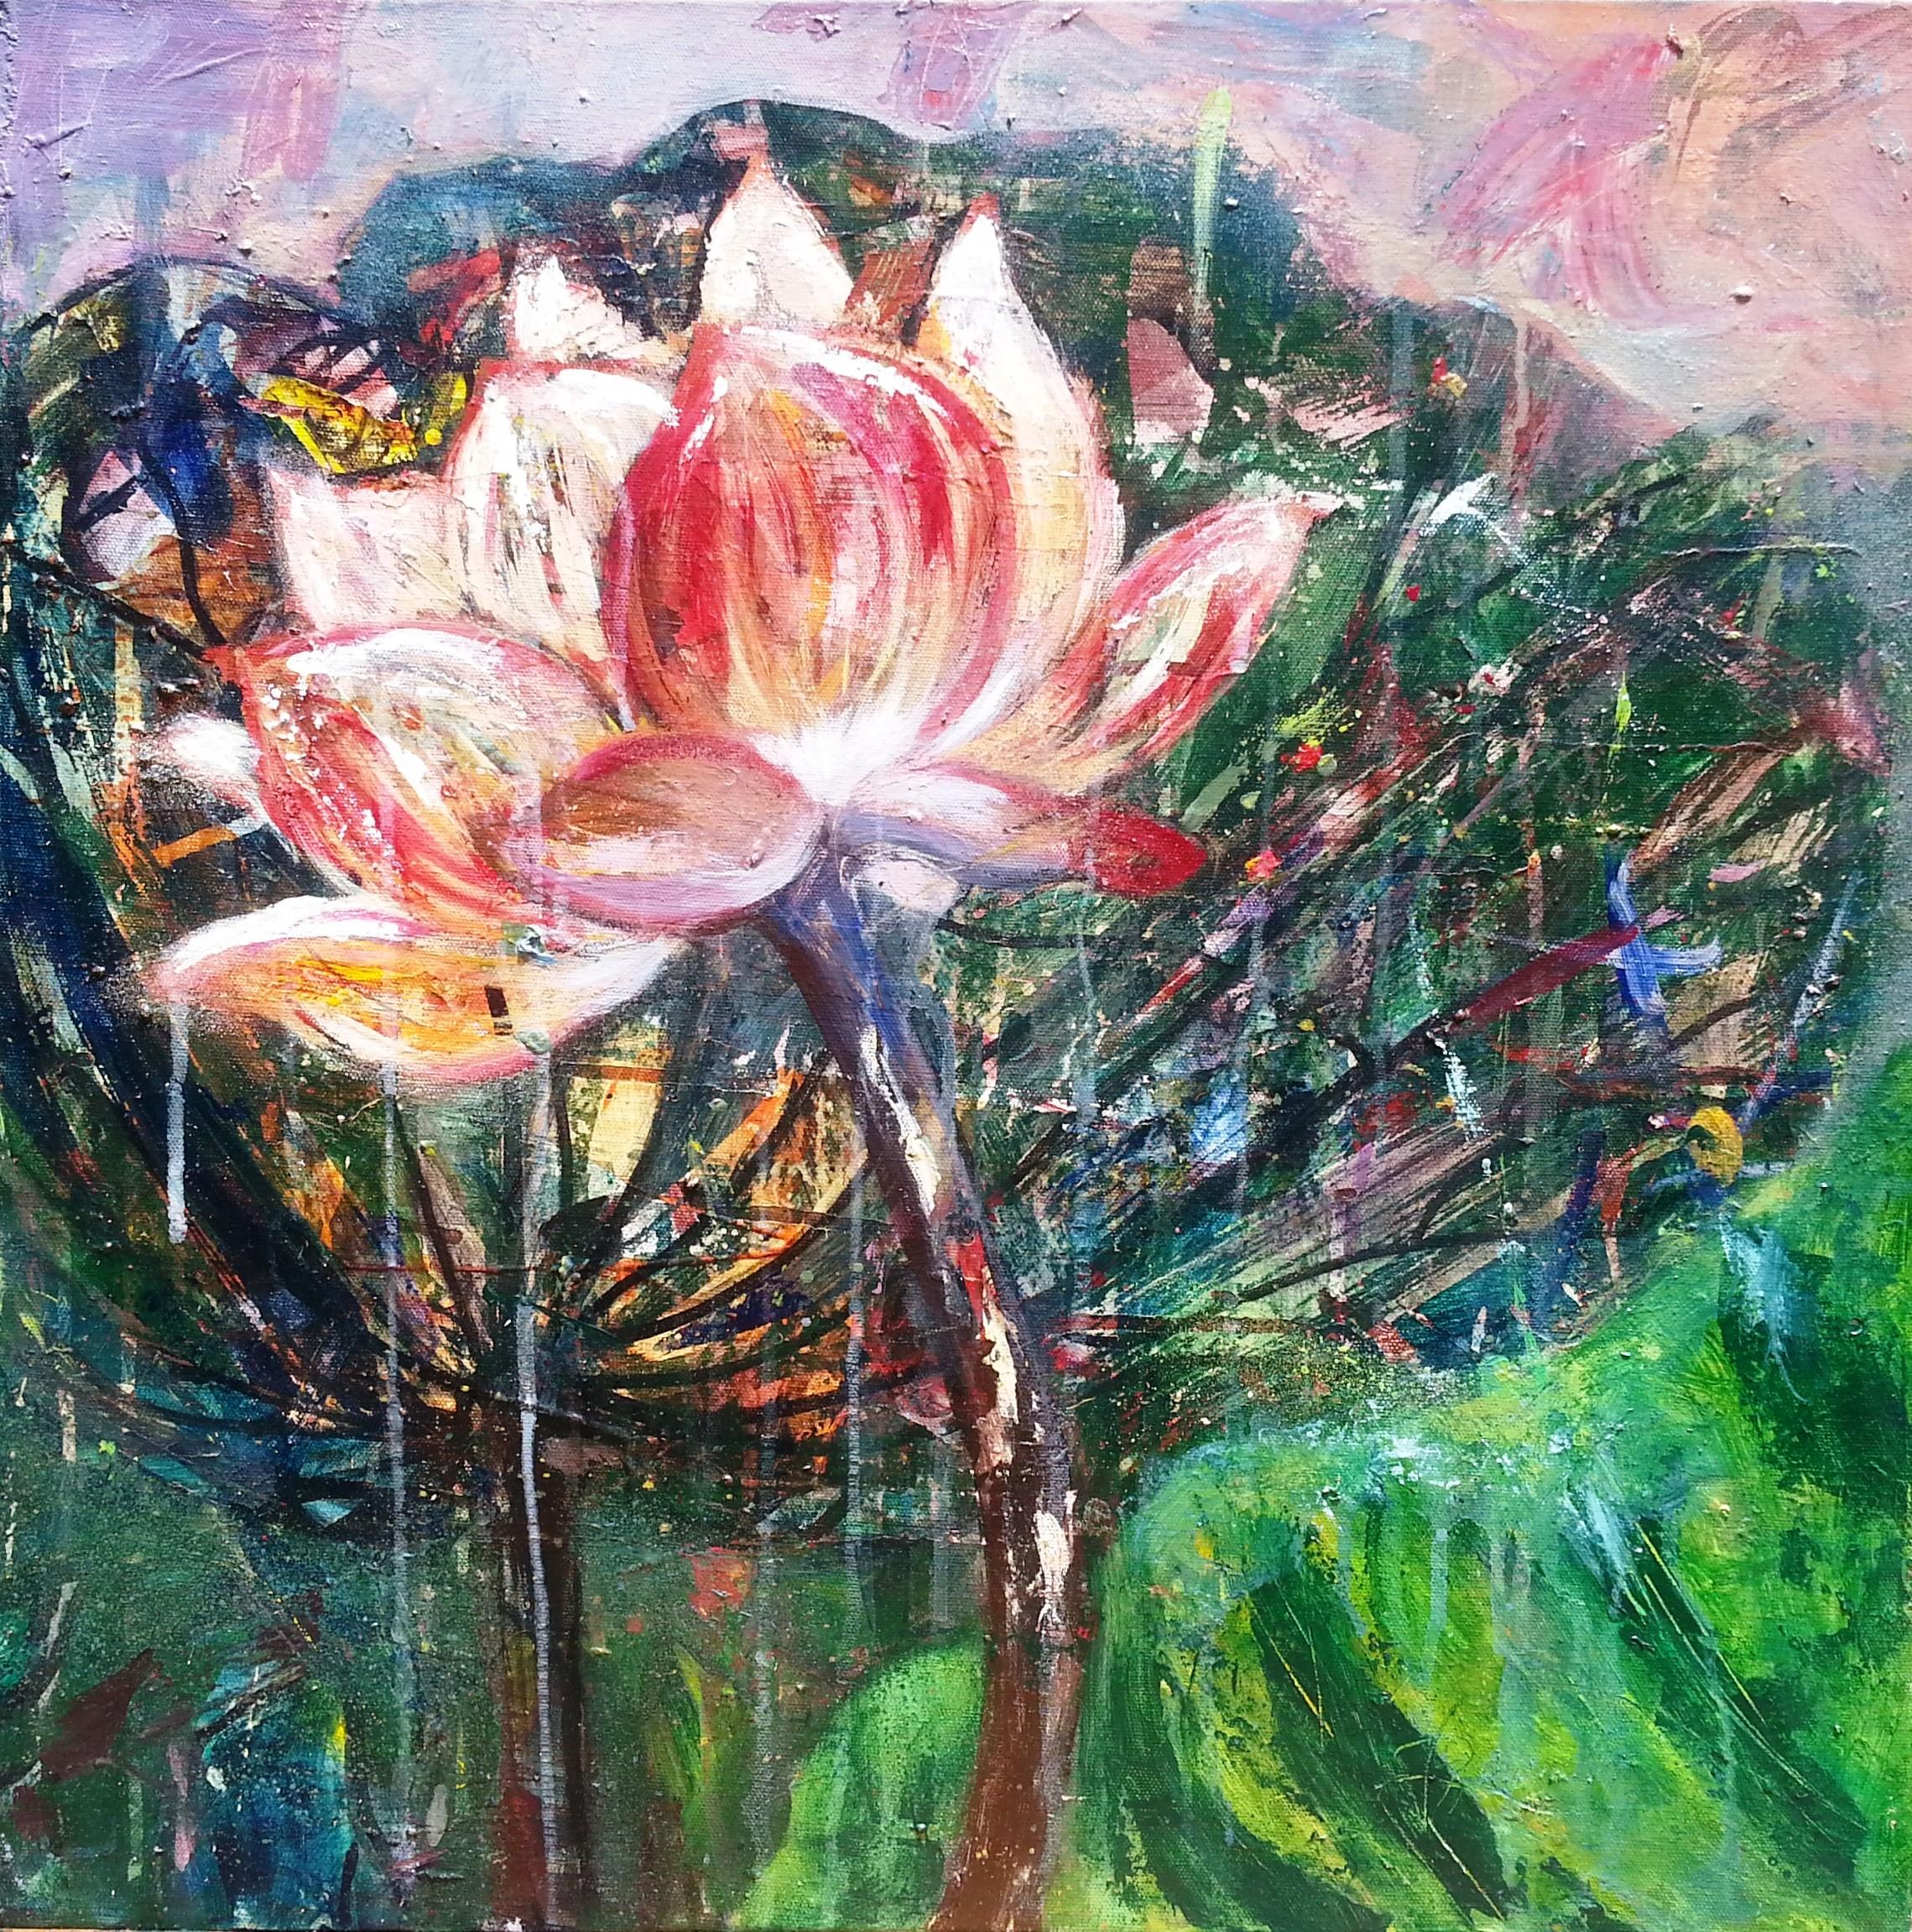 untitled xxv by Dilantha Upul